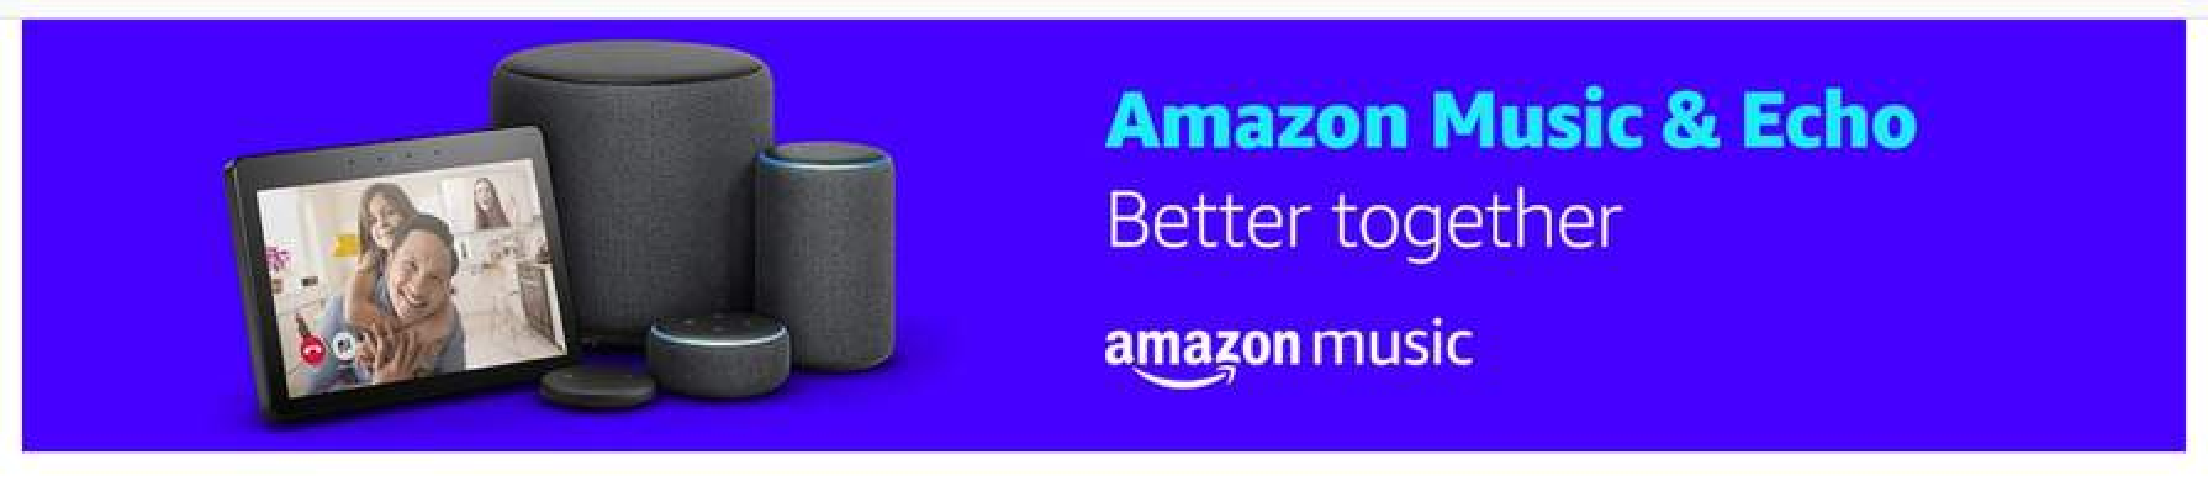 3 Months Amazon Music Unlimited 099 Prime Non Prime New